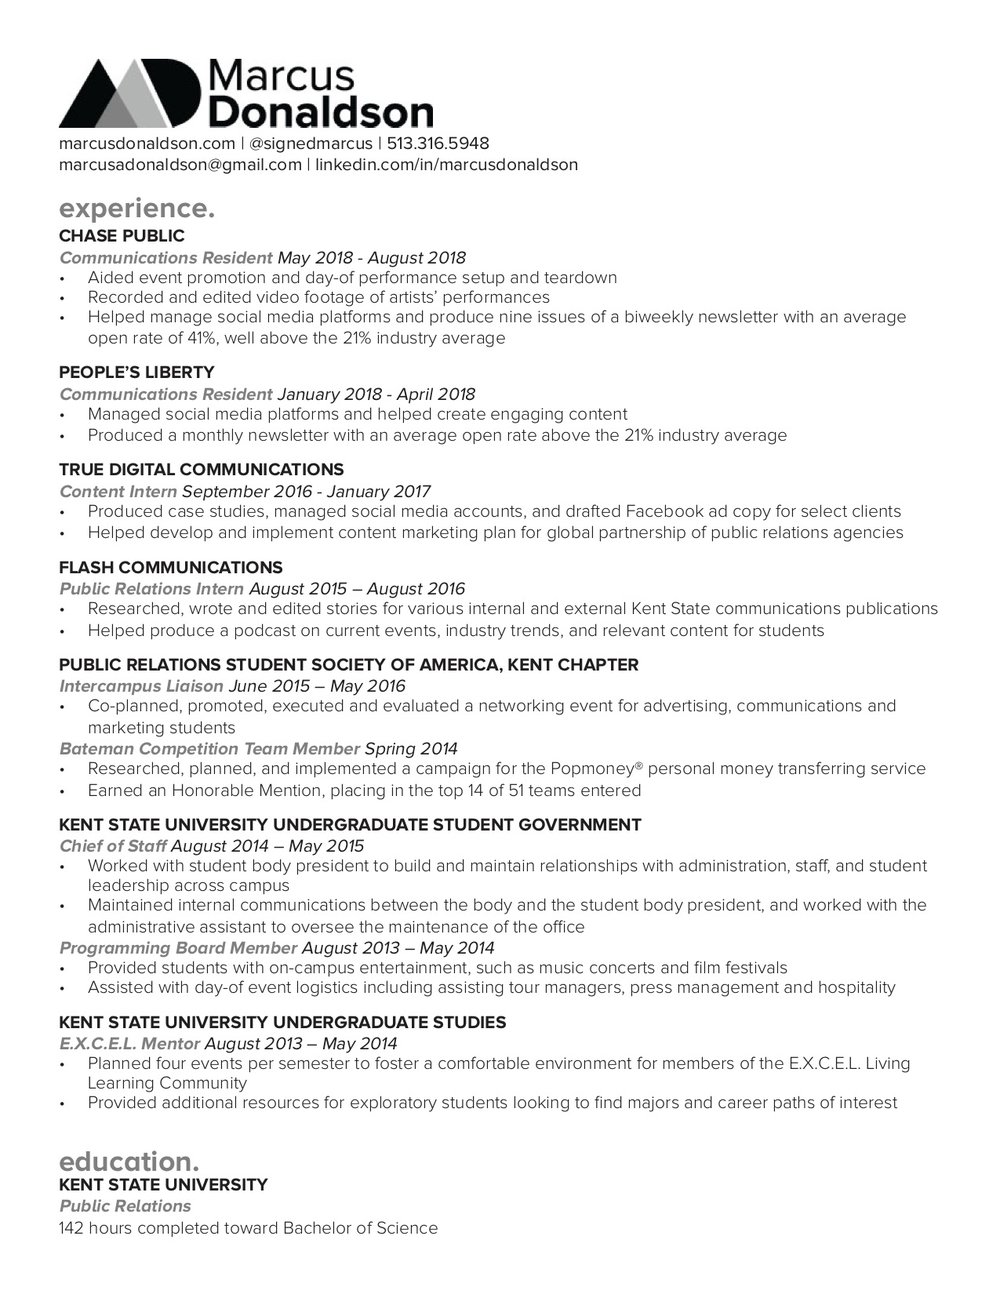 MarcusDonaldson - resume1 copy.jpg